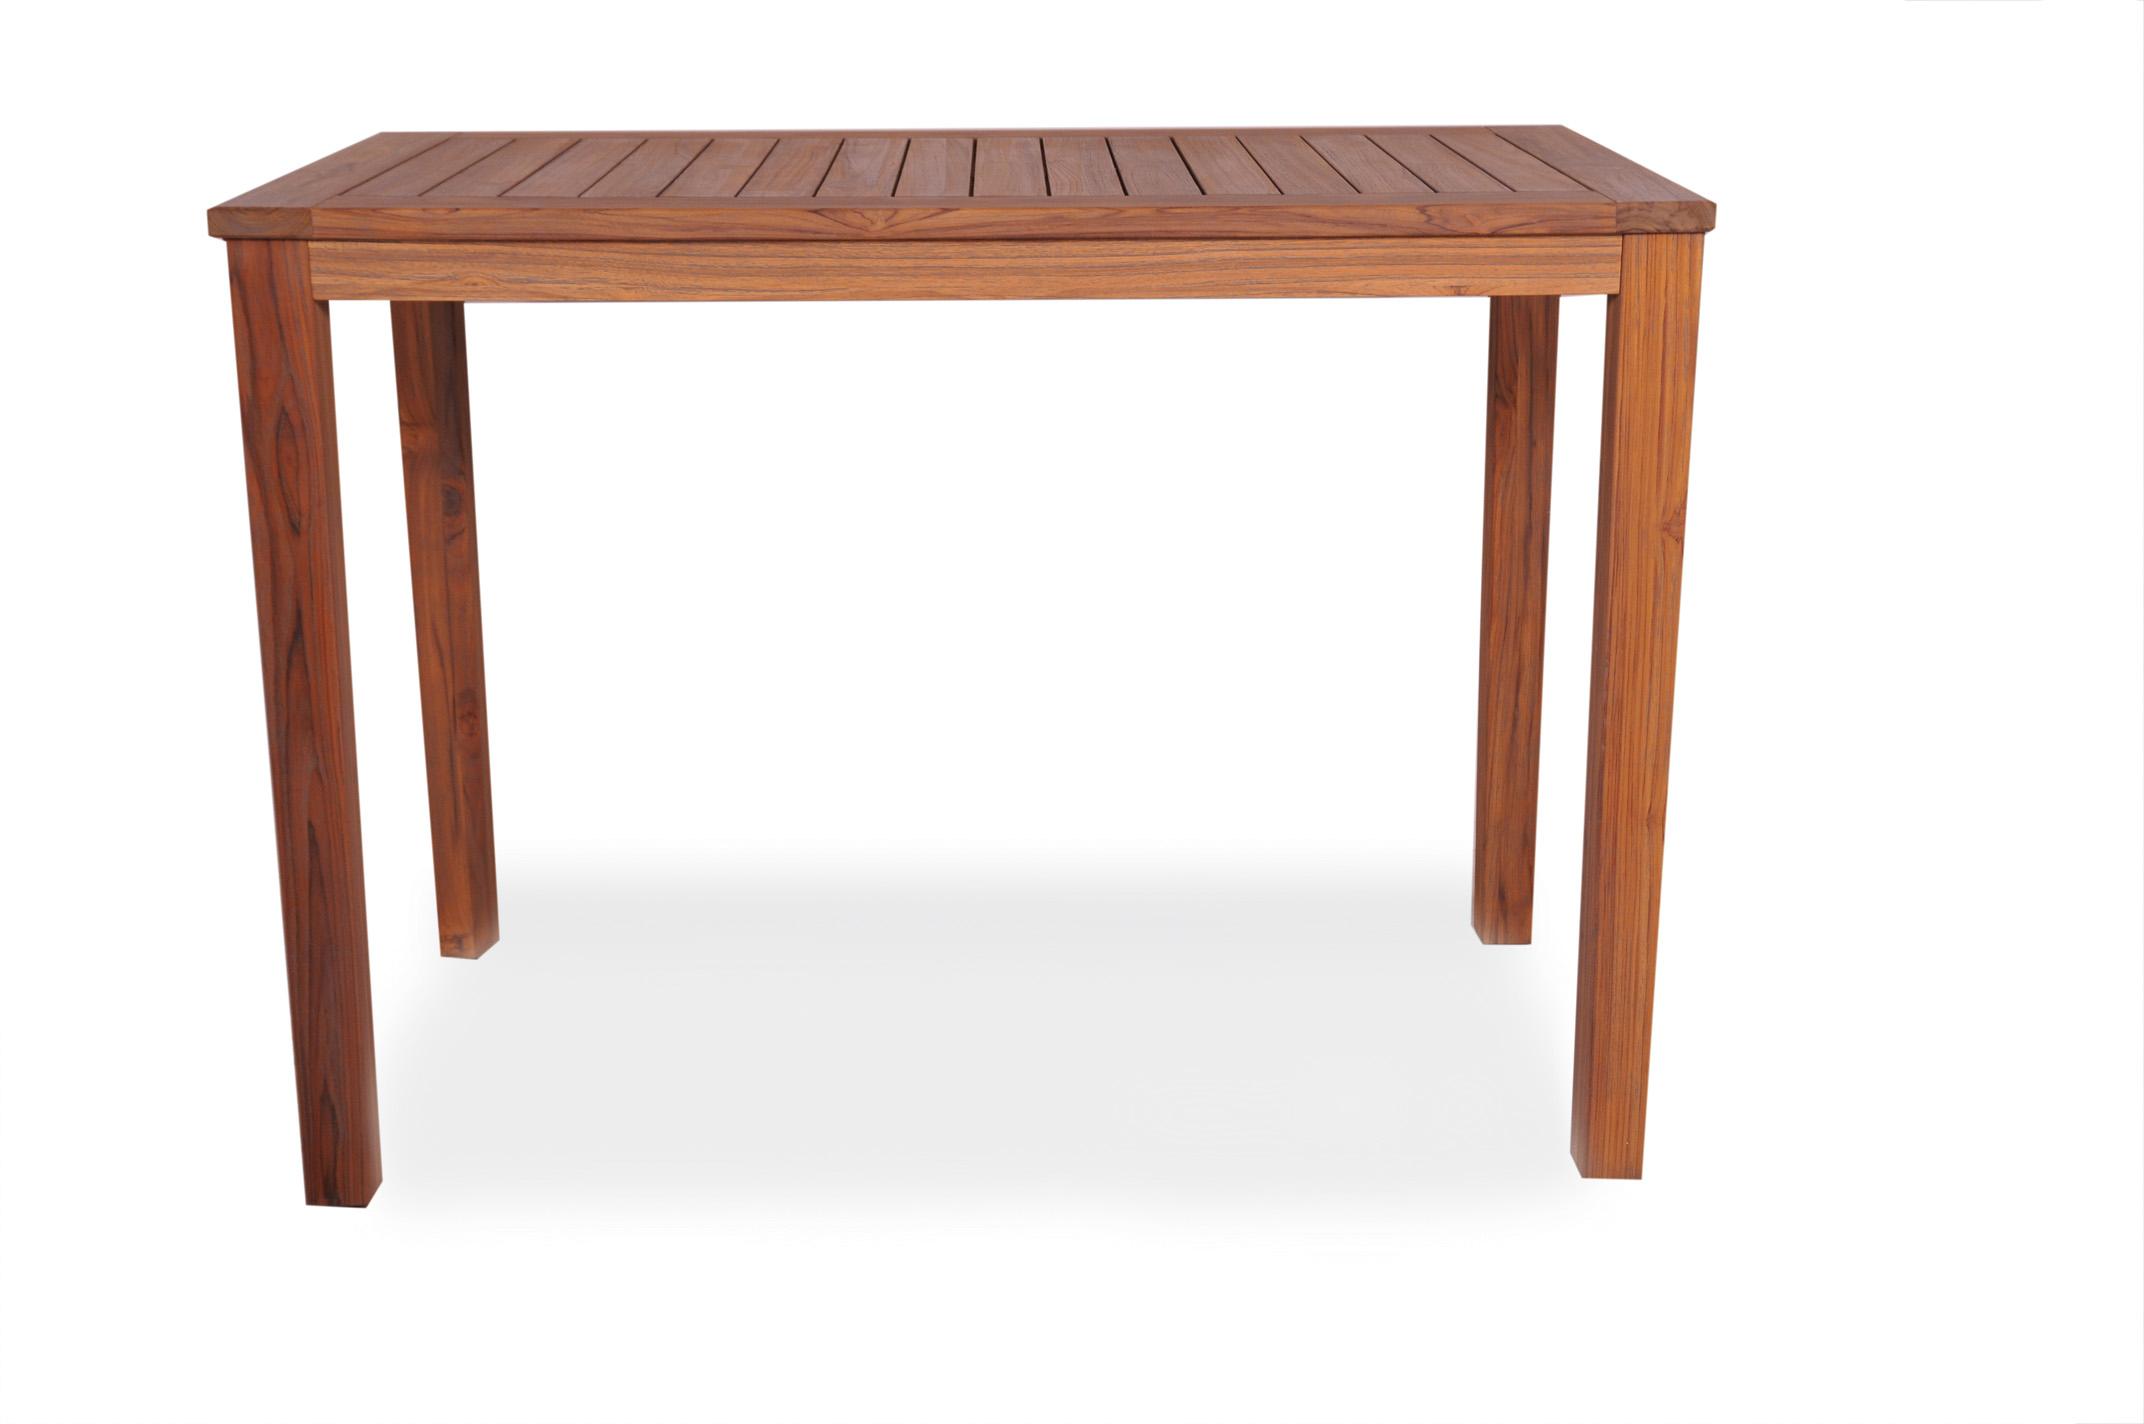 Teak Tables Antonelli S Furniture Melbourne Fl